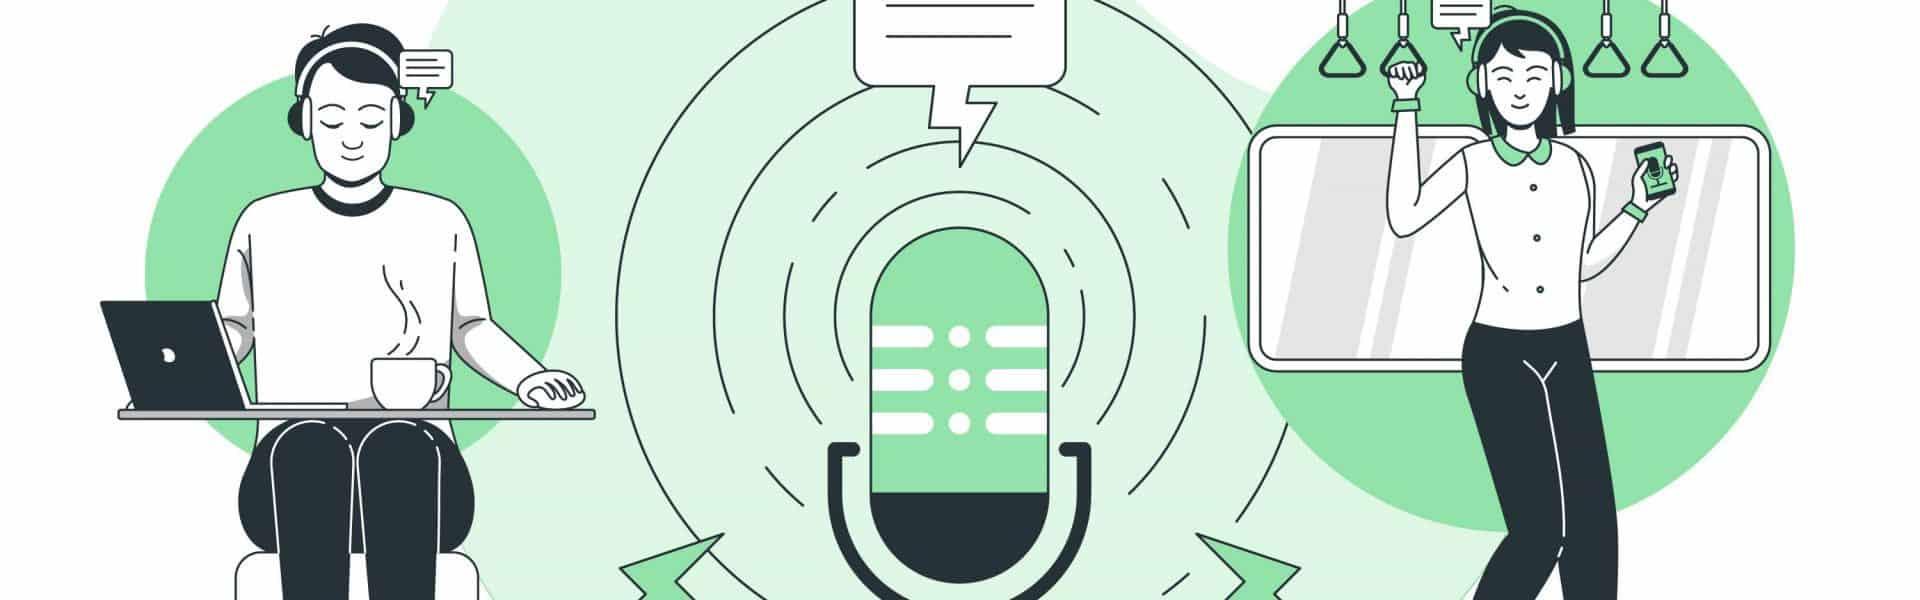 invatare activa podcasting in educatie